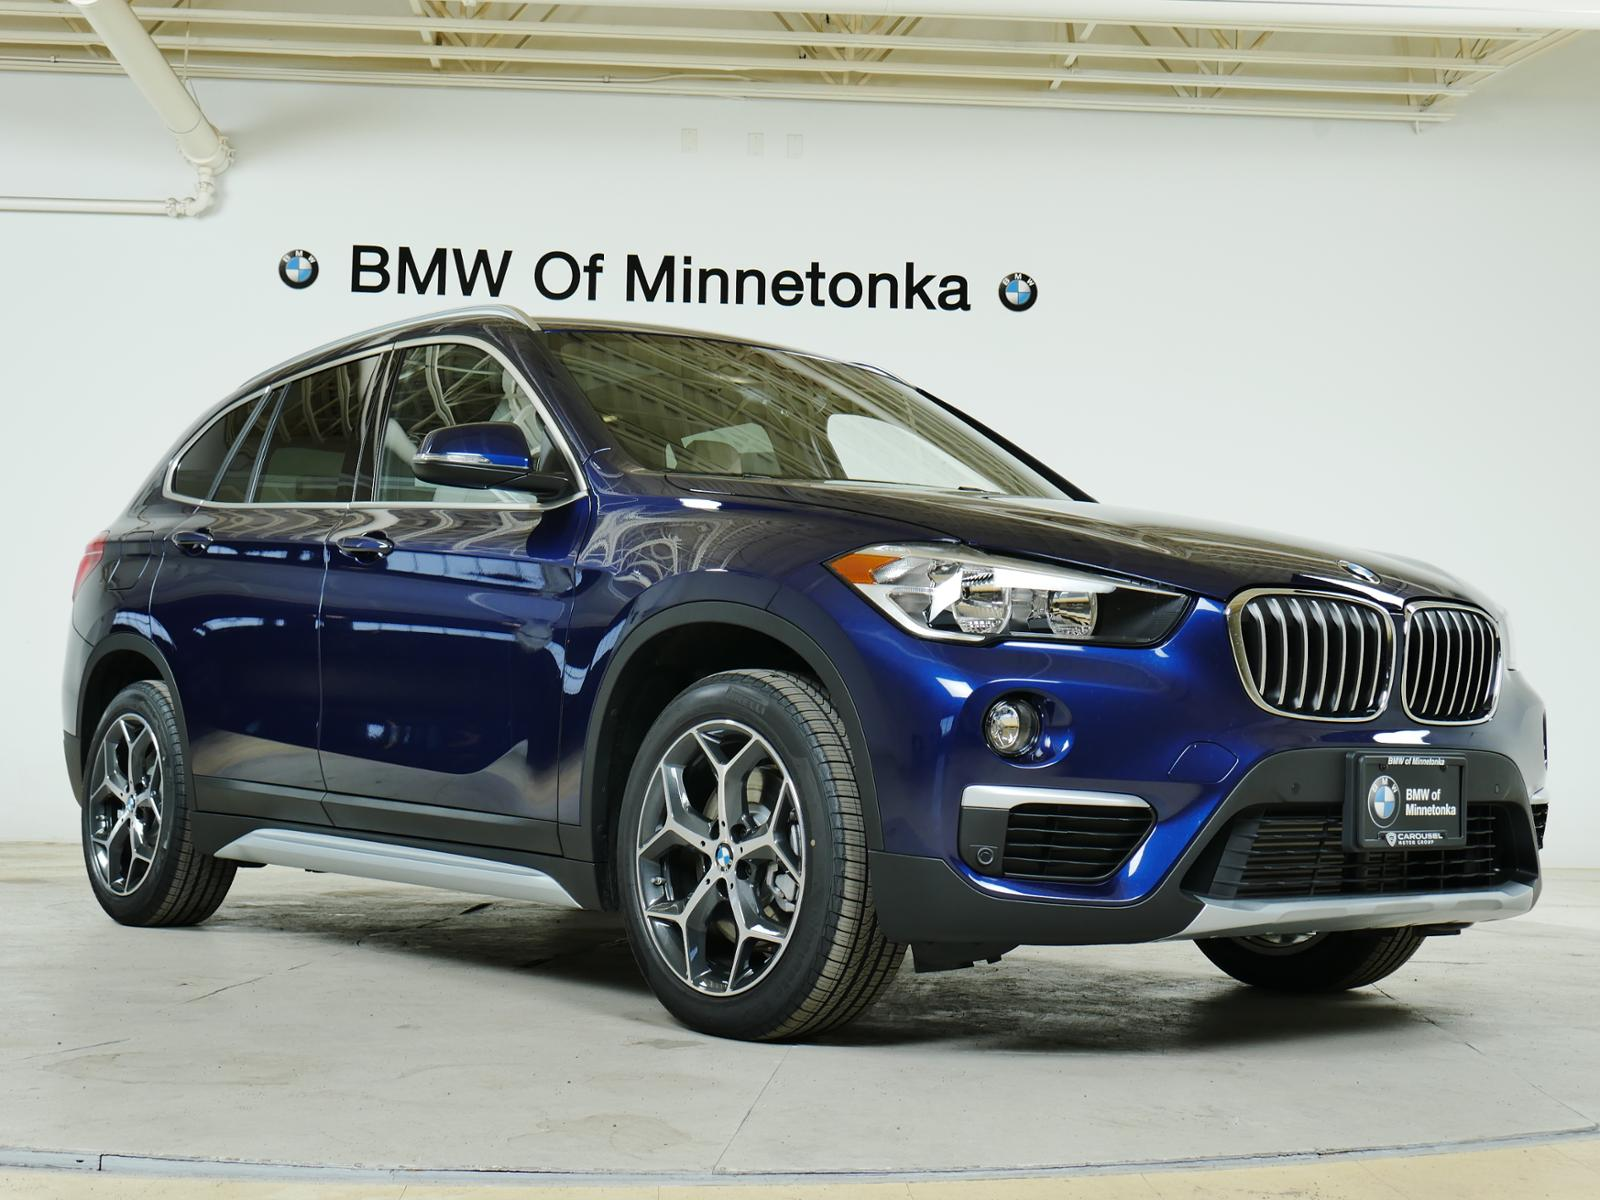 2019 BMW X1 Xdrive28i SUV in Minnetonka, MN